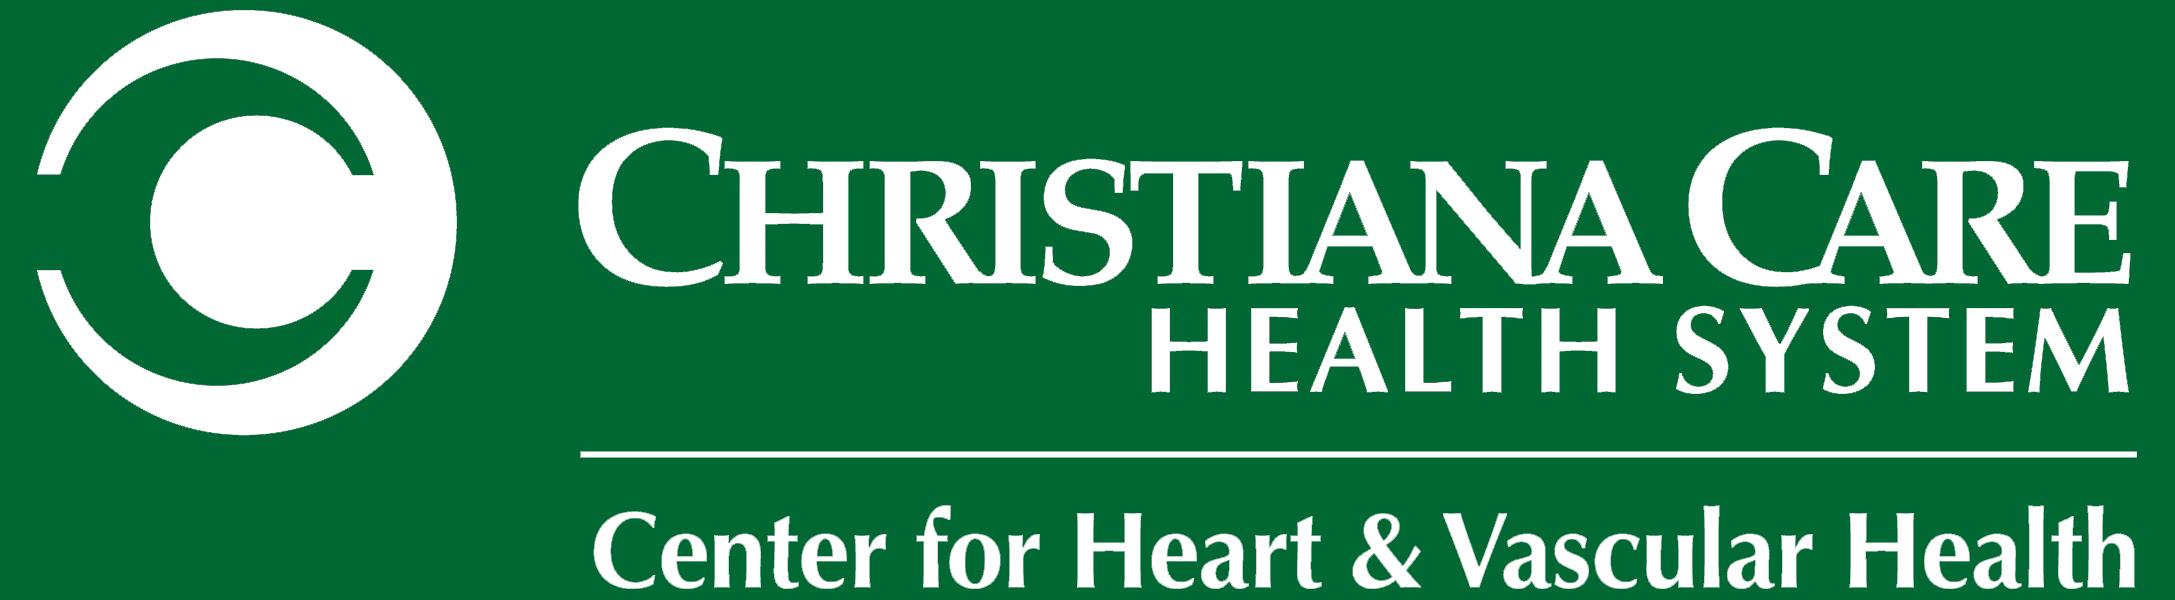 Christiana Care Health System – Center for Heart